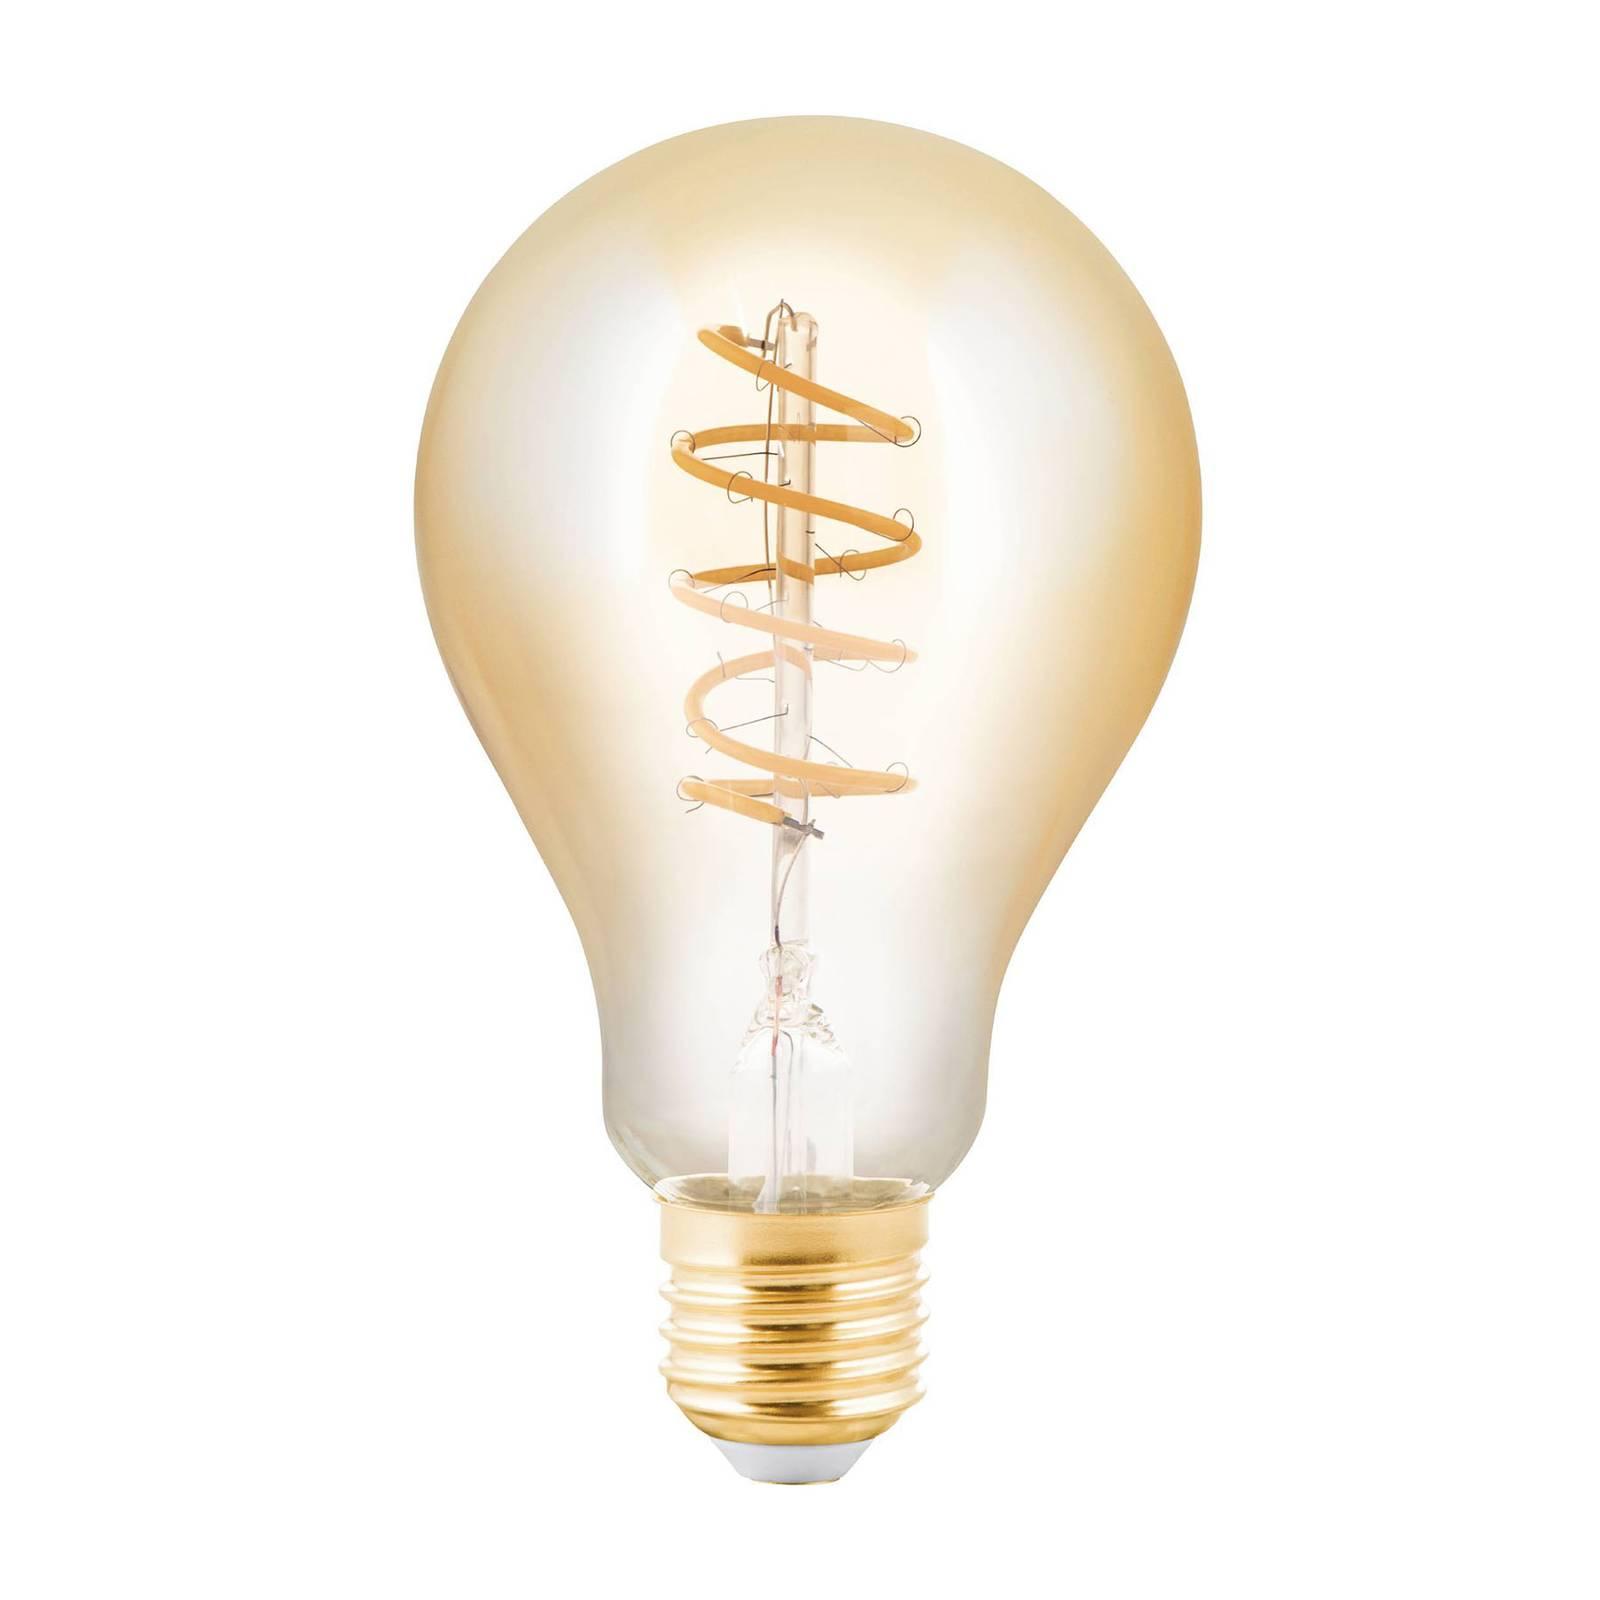 Lampadina LED E27 4W a pera ambra